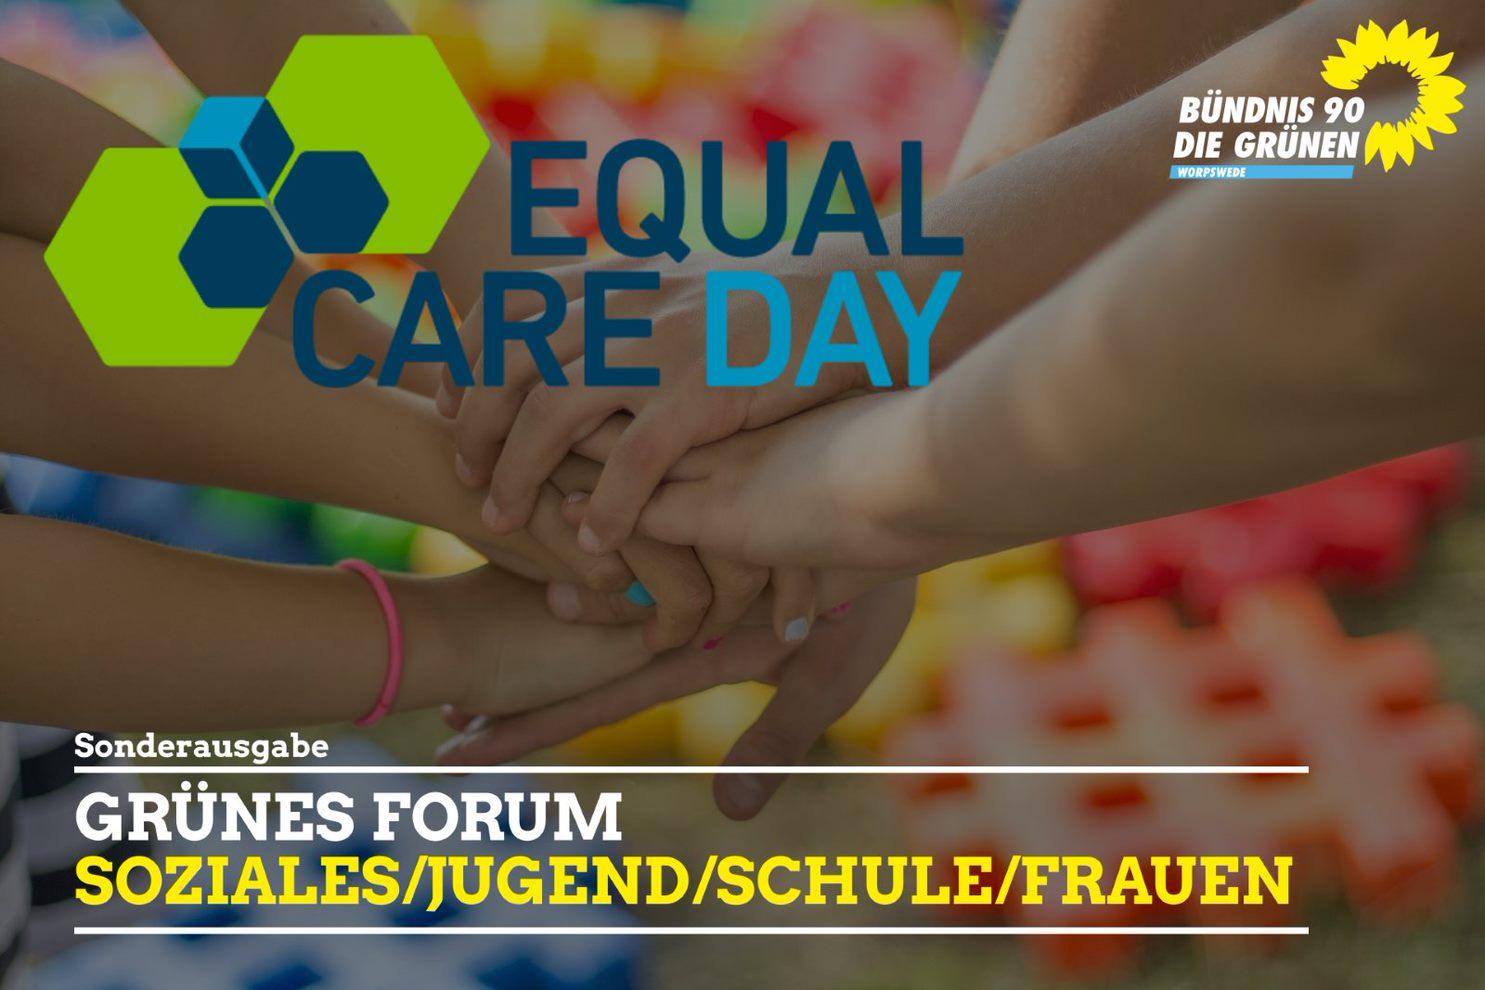 Grünes Forum Soziales Sonderausgabe zum Equal Care Day